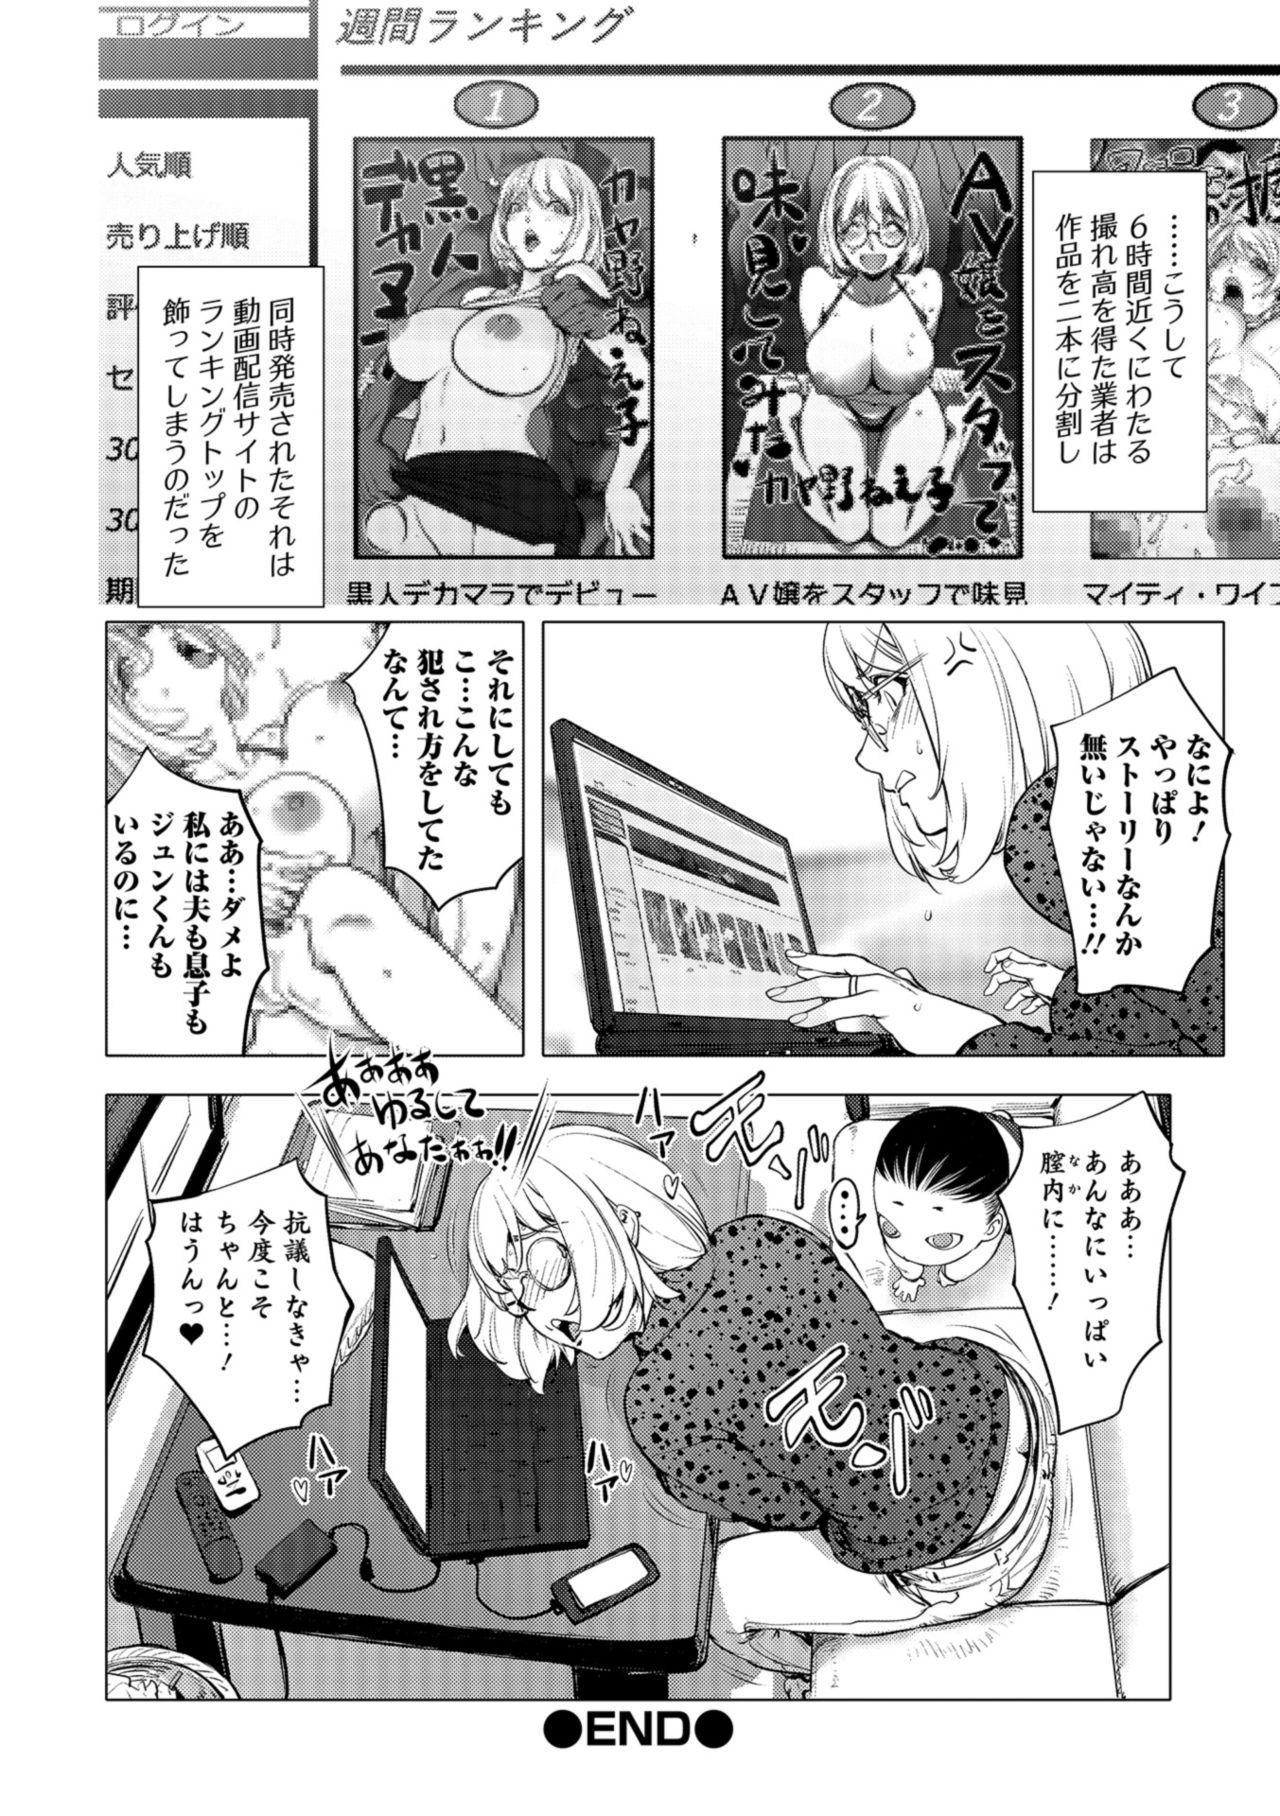 COMIC Shigekiteki SQUIRT!! Vol. 09 75